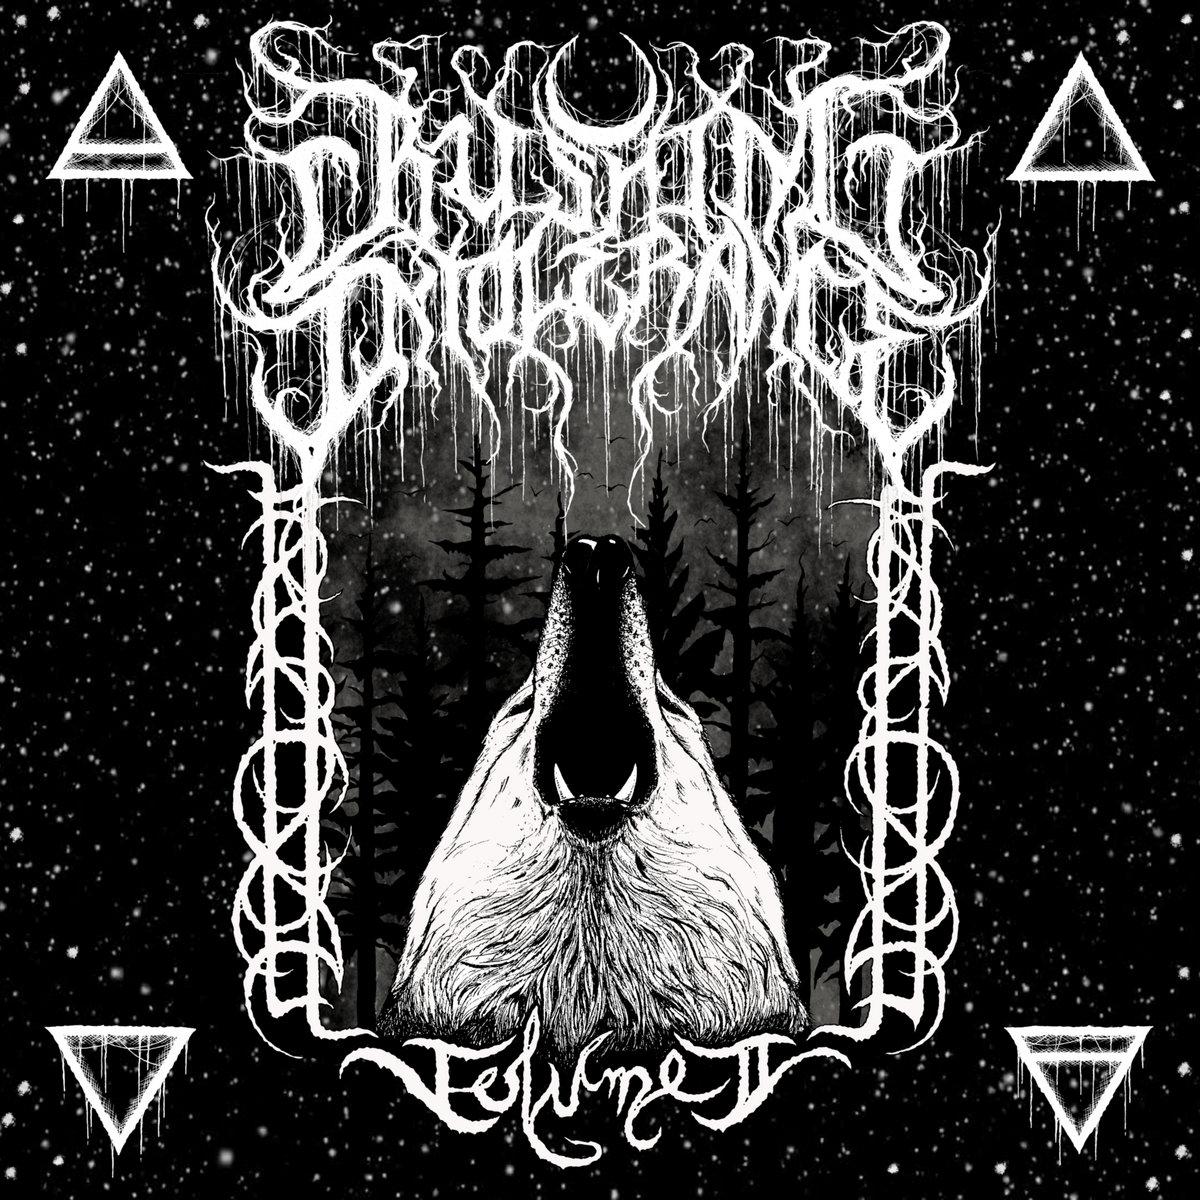 Awesome Walls From Crushing Intolerance Volume By Black Metal Alliance Drown Black Metal Alliance Black Metal Artist Elected Black Metal Art houzz 01 Black Metal Art